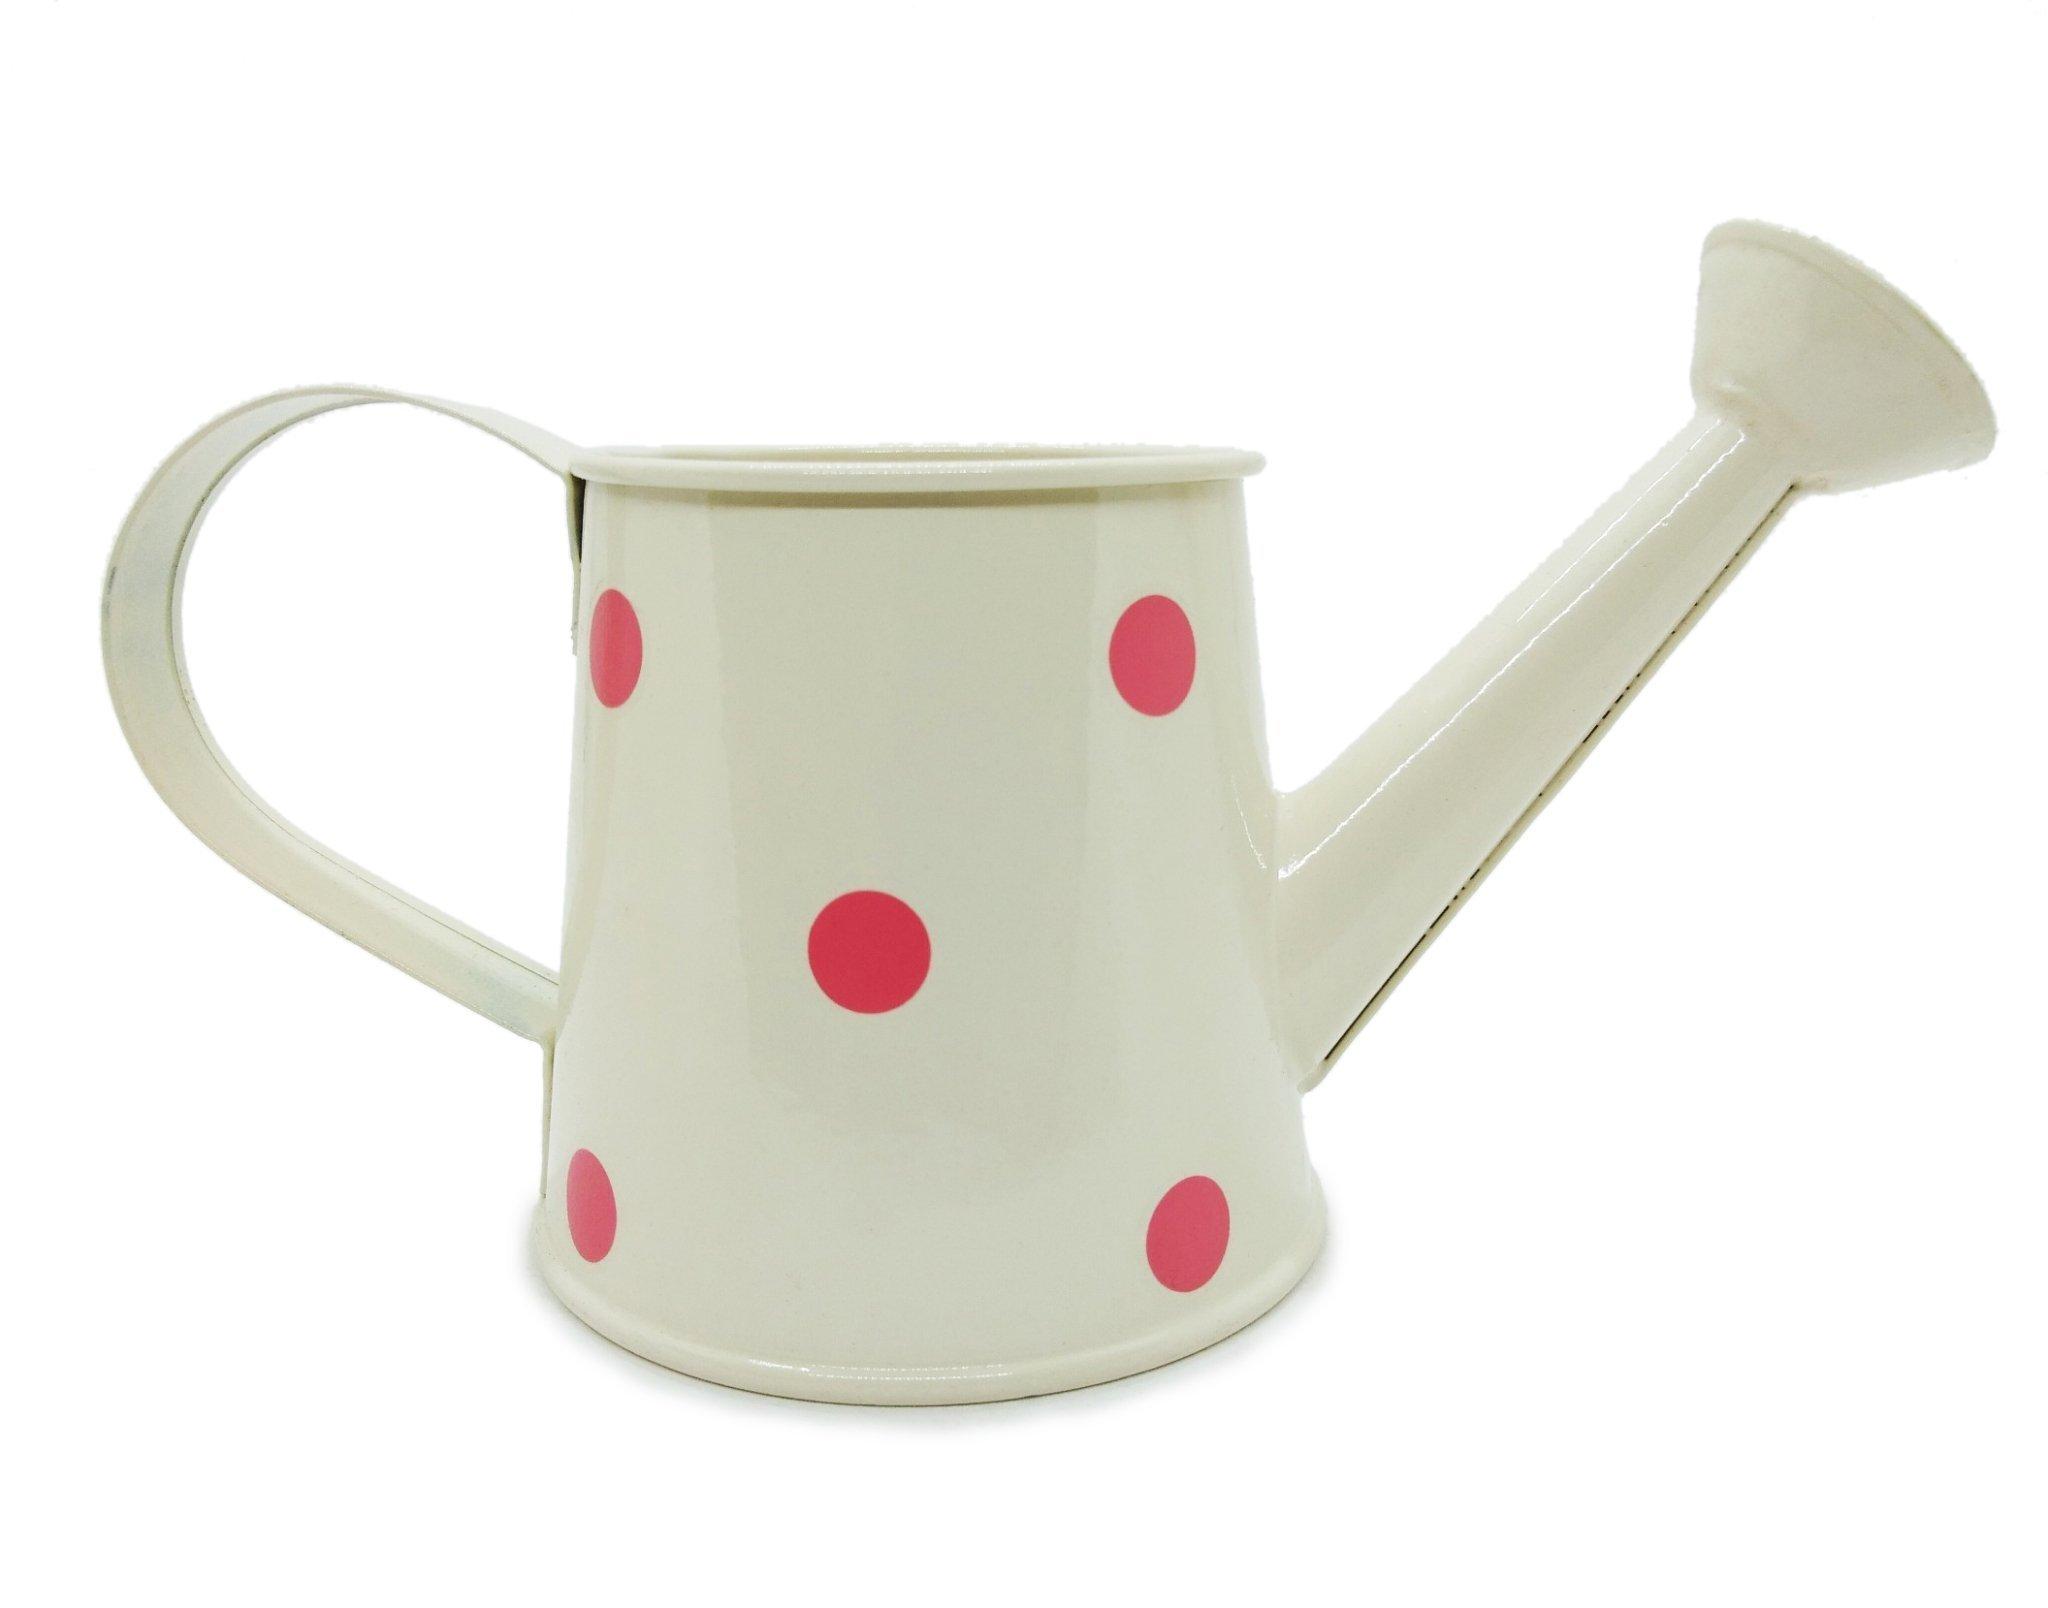 WitnyStore Watering Can Polka Dot Vintage Pot Garden Decor Miniature Sprinkler Nozzle Flower Arrangement (White)